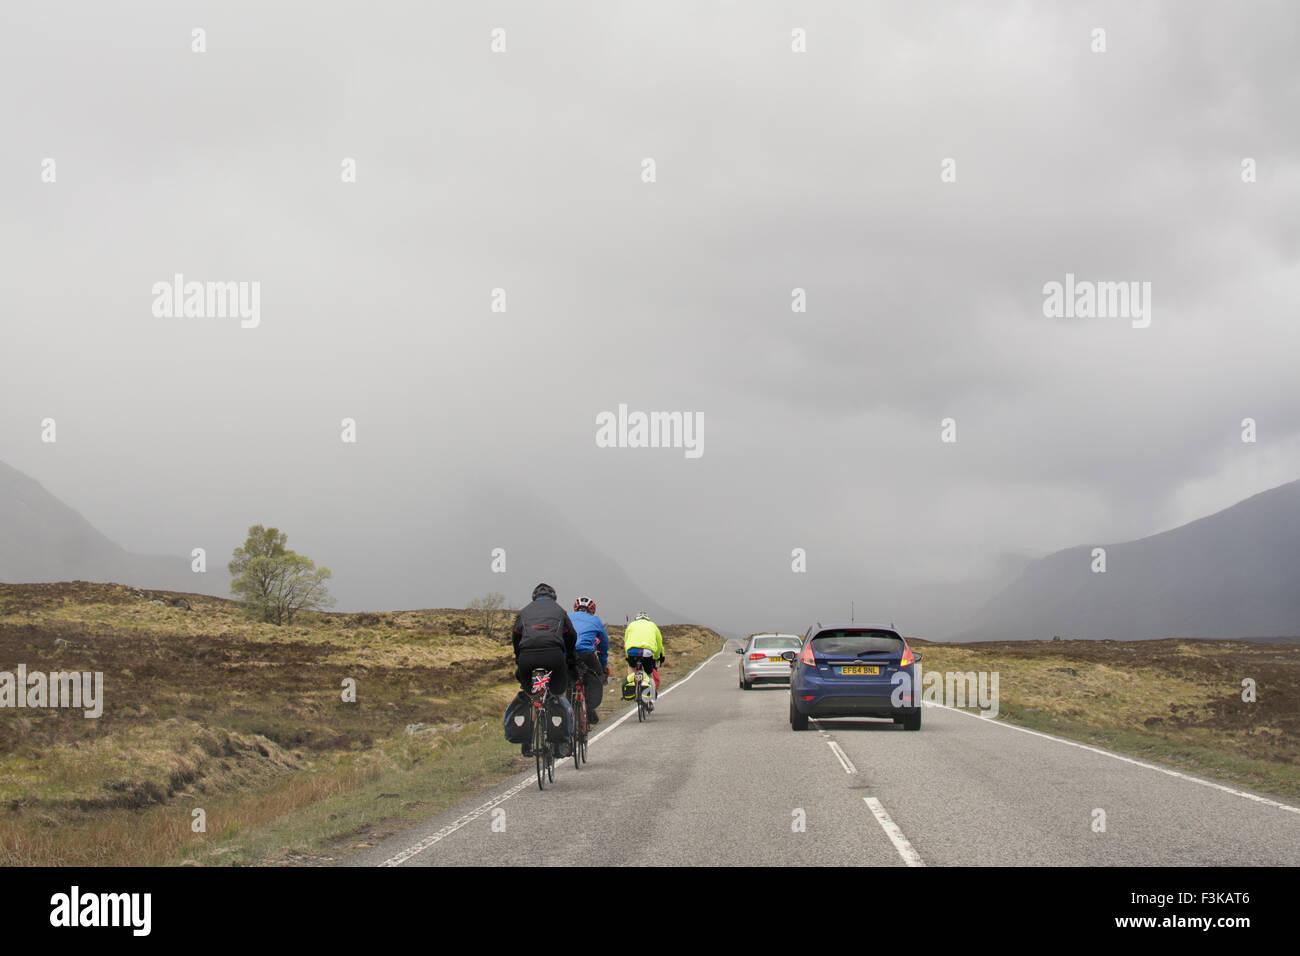 Coches ciclistas da un montón de espacio, ya que adelantar en la carretera A82 a través de Glencoe, Scotland, Imagen De Stock